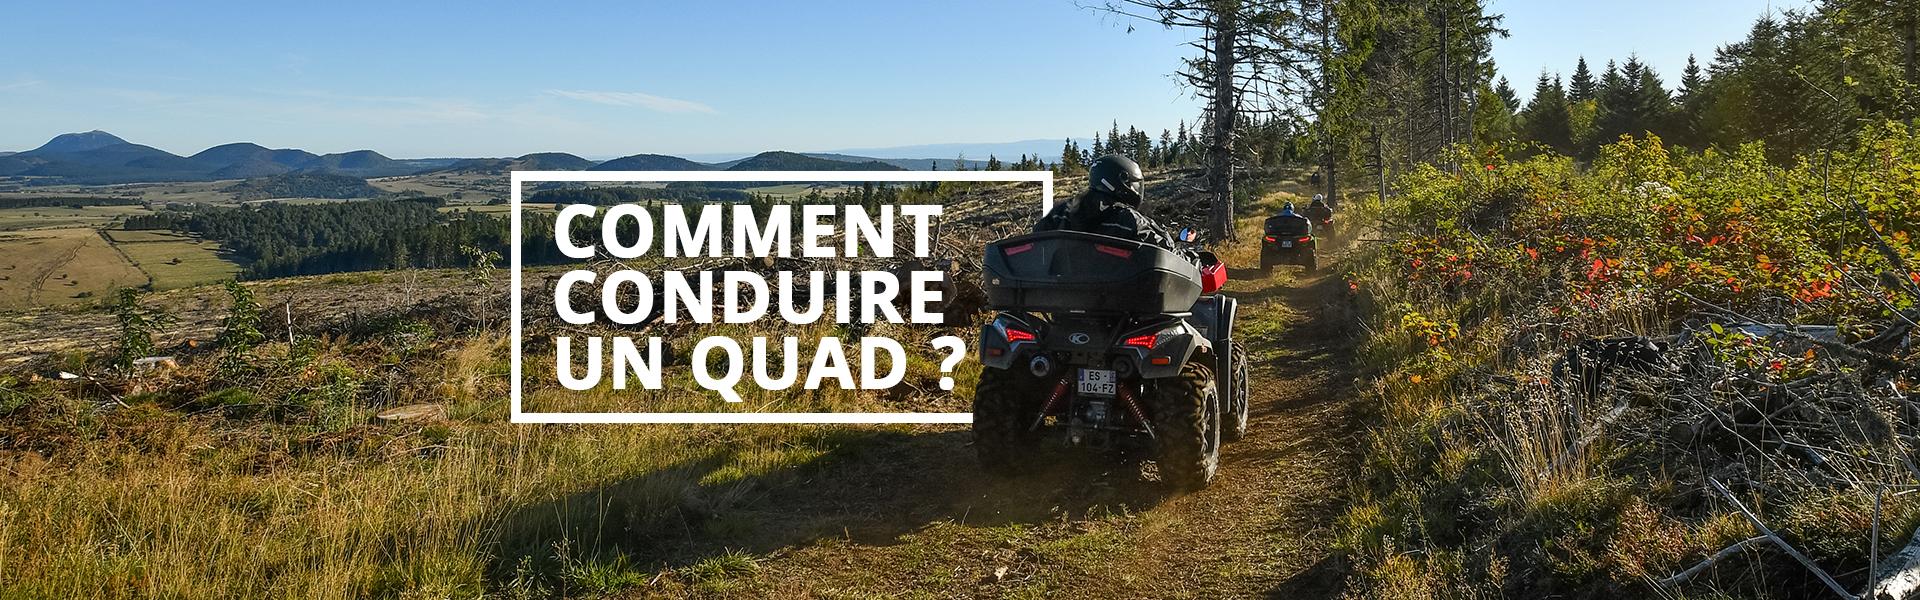 comment-conduire-quad